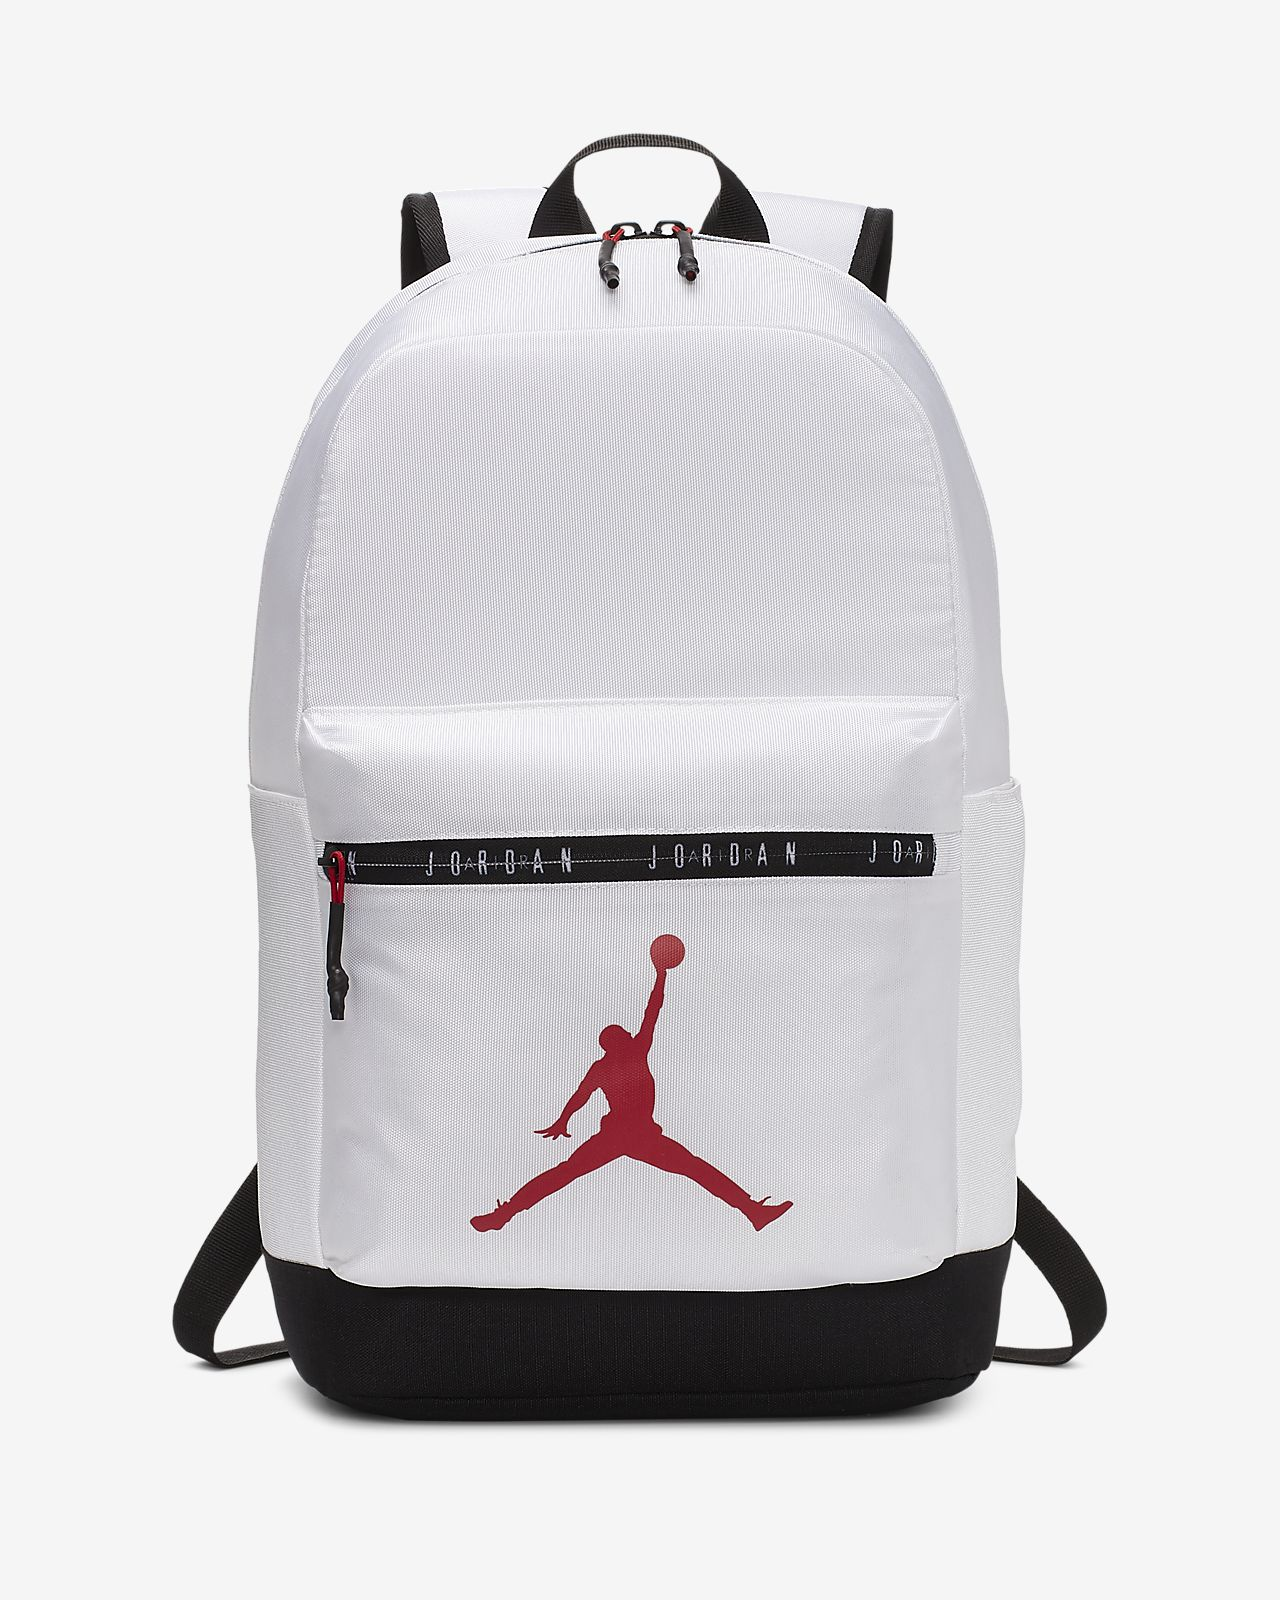 8587be27b29 Jordan DNA Backpack. Nike.com